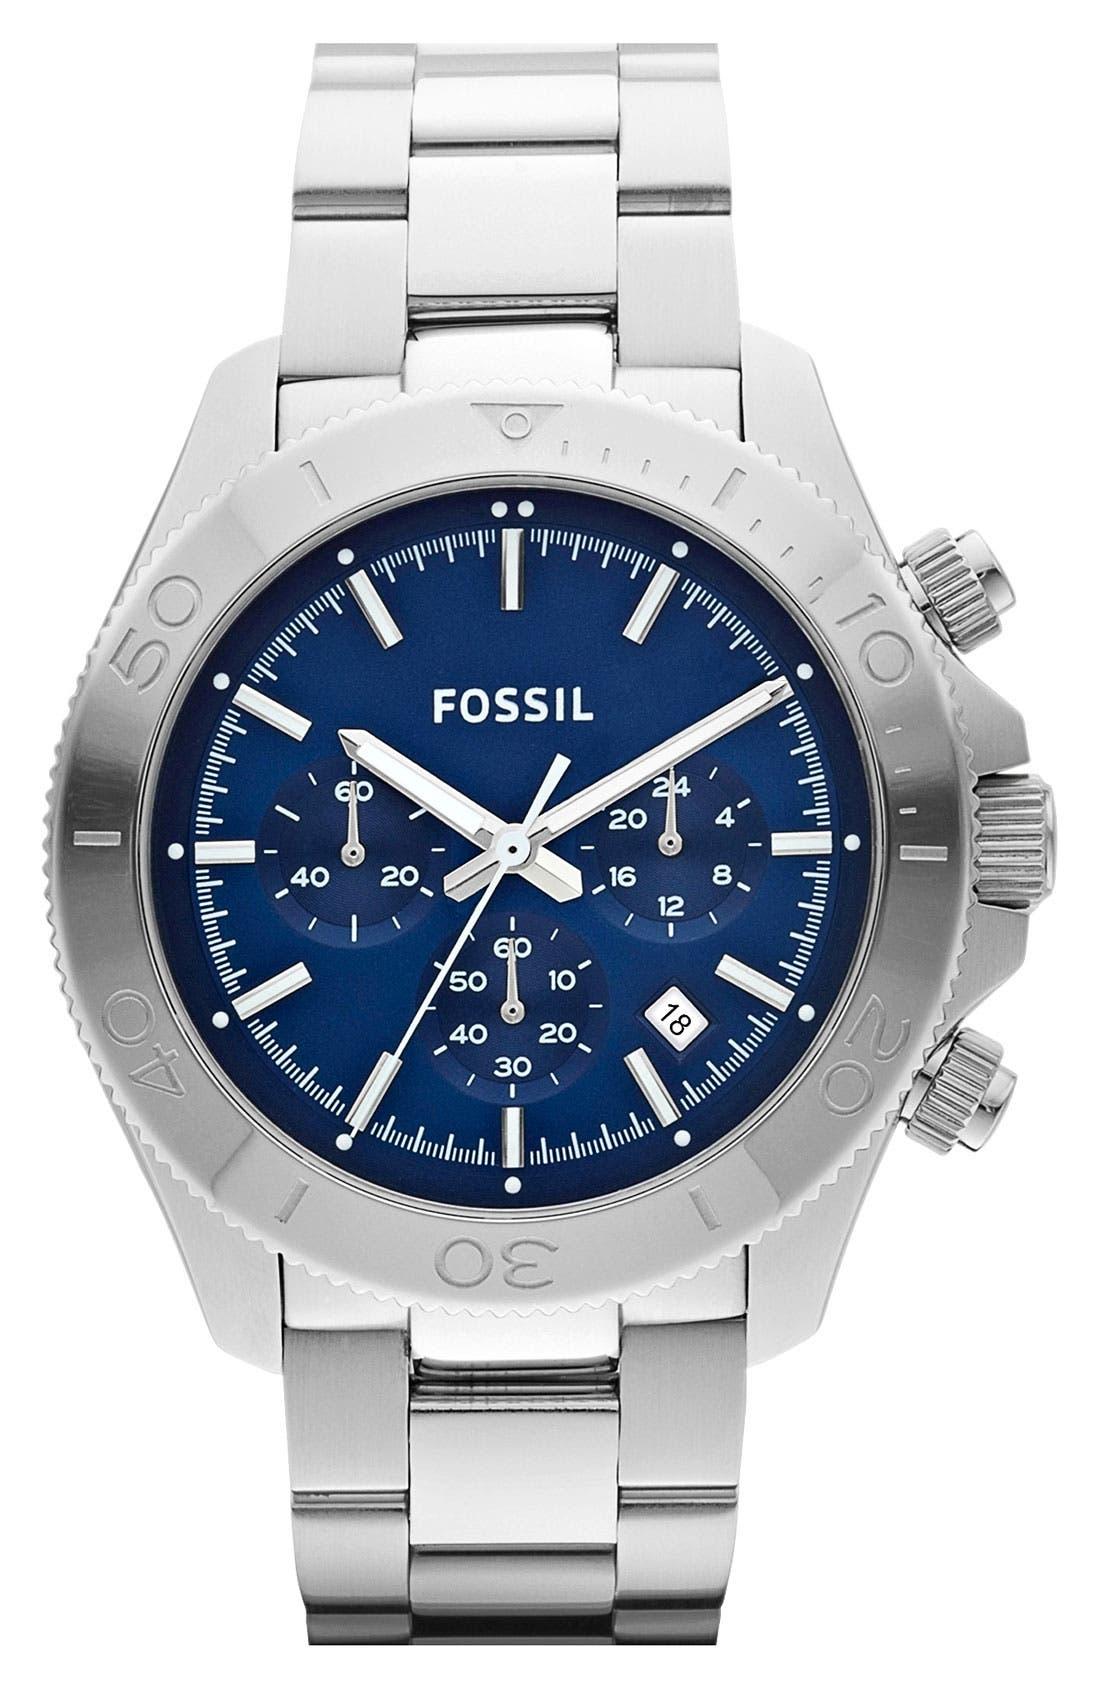 Main Image - Fossil 'Retro Traveler' Chronograph Bracelet Watch, 45mm